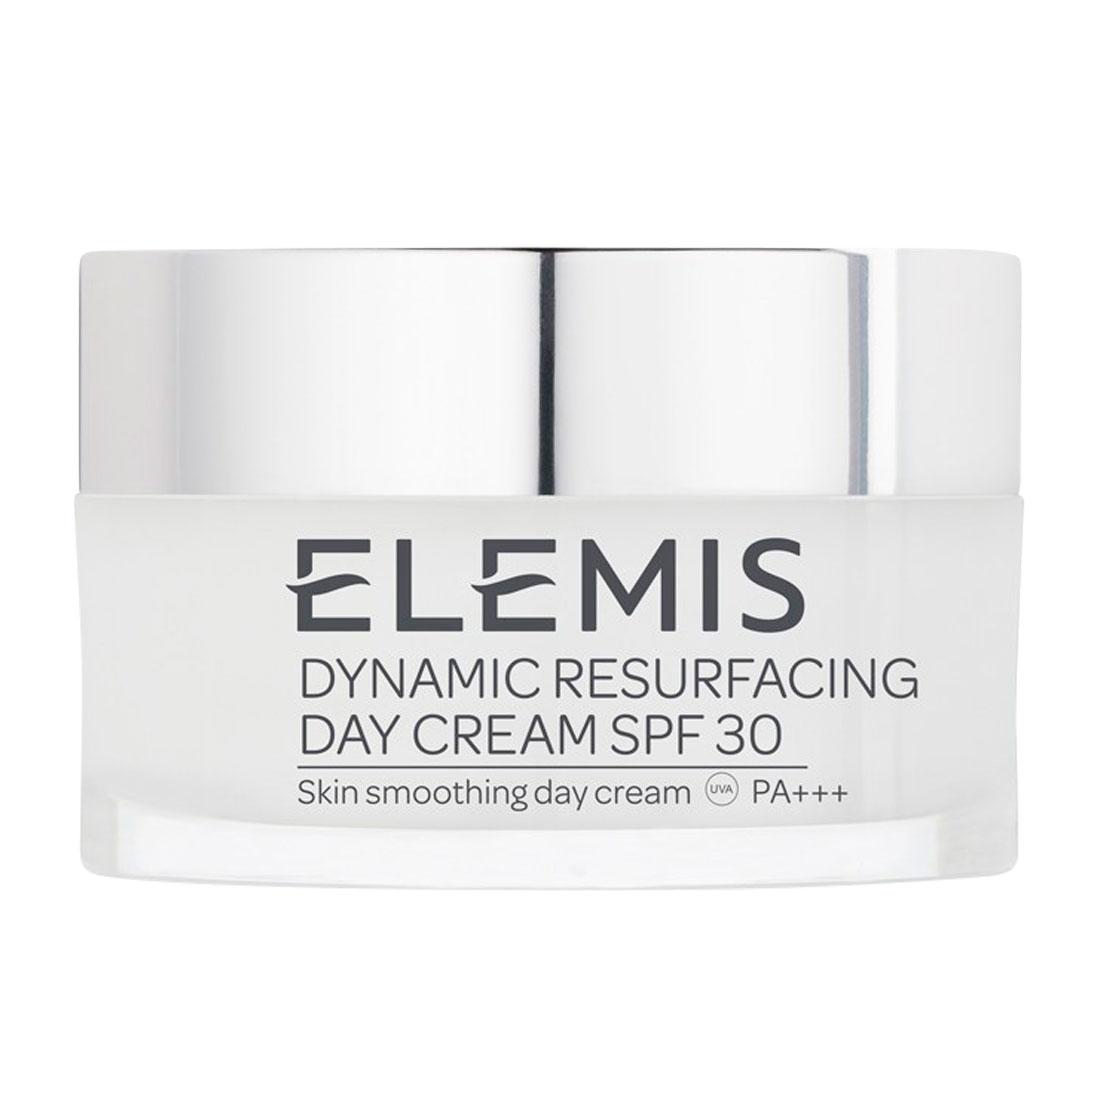 Dynamic Resurfacing Day Cream SPF 30 50ml